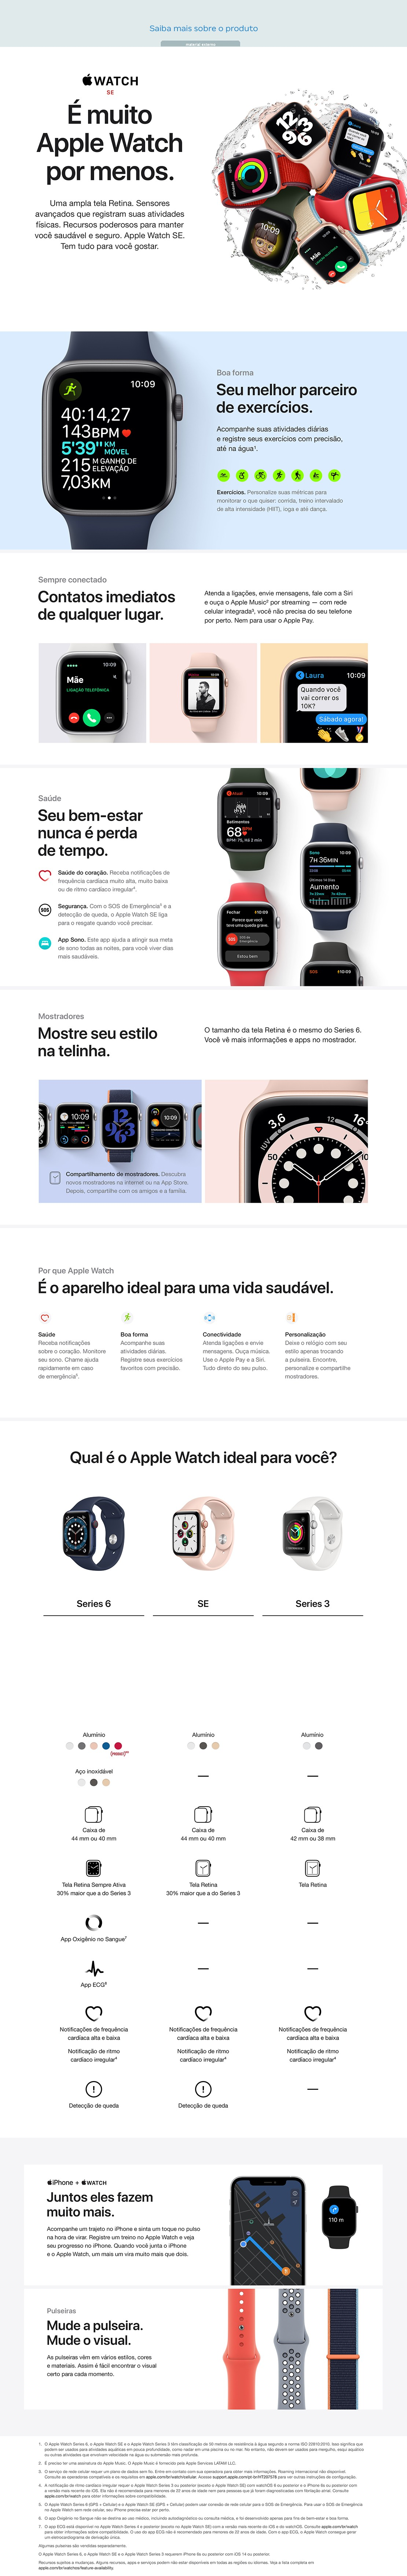 https://conteudoproduto.magazineluiza.com.br/22/227234500/Index.jpg